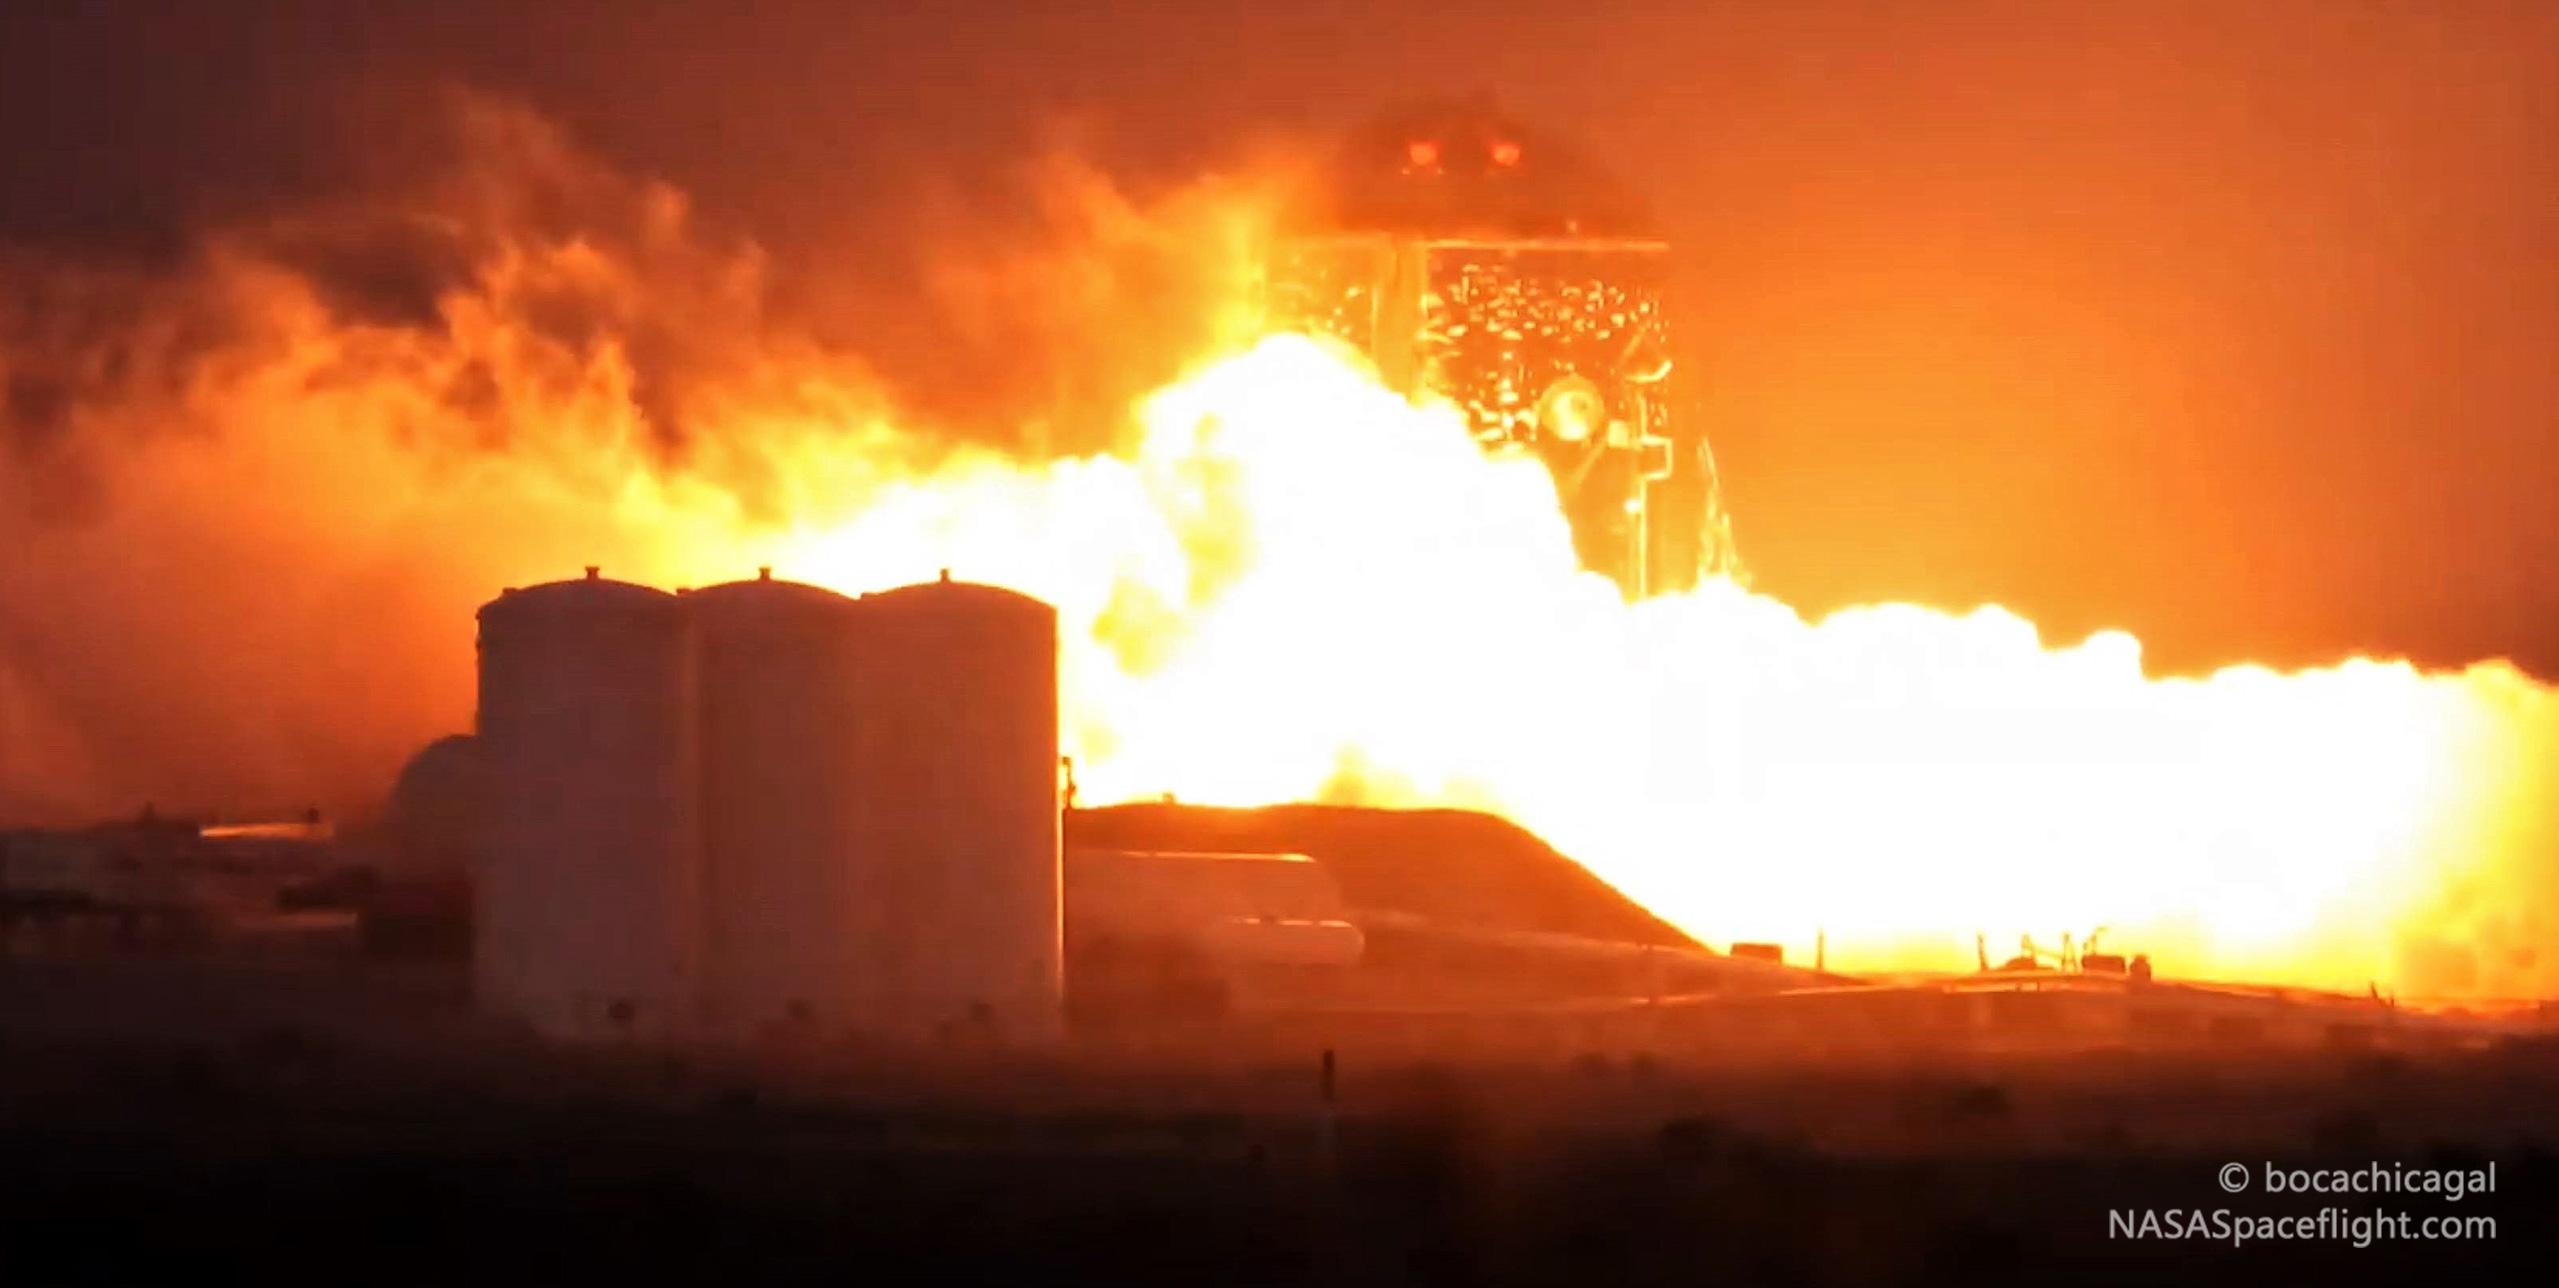 Boca Chica Starhopper Raptor ignition 040319 (NASASpaceflight – bocachicagal) 1 edit 1